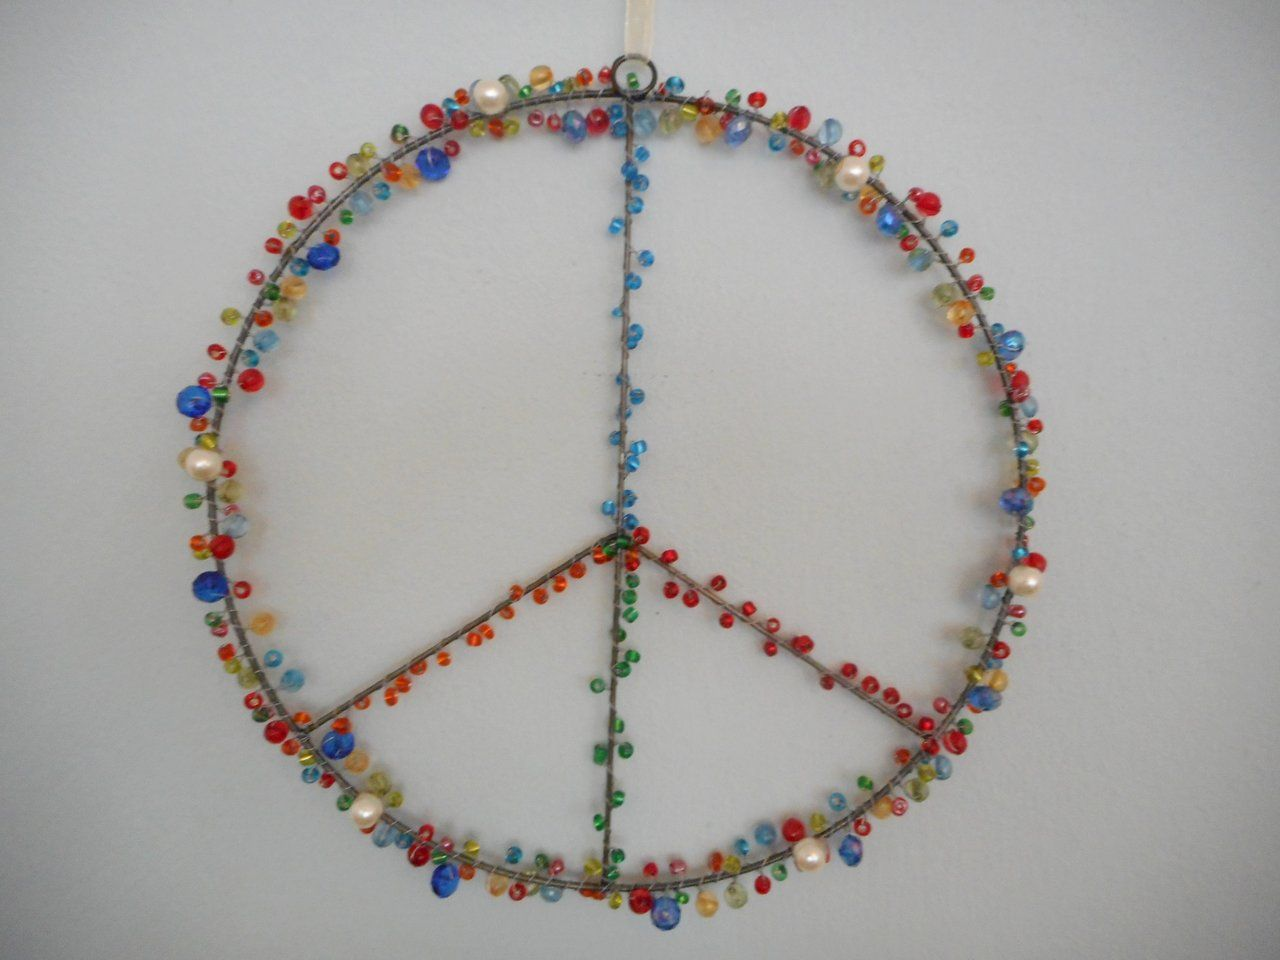 Peacezeichen mit bunten Perlen Fensterdeko 20 cm | Fensterdeko, Bunt ...